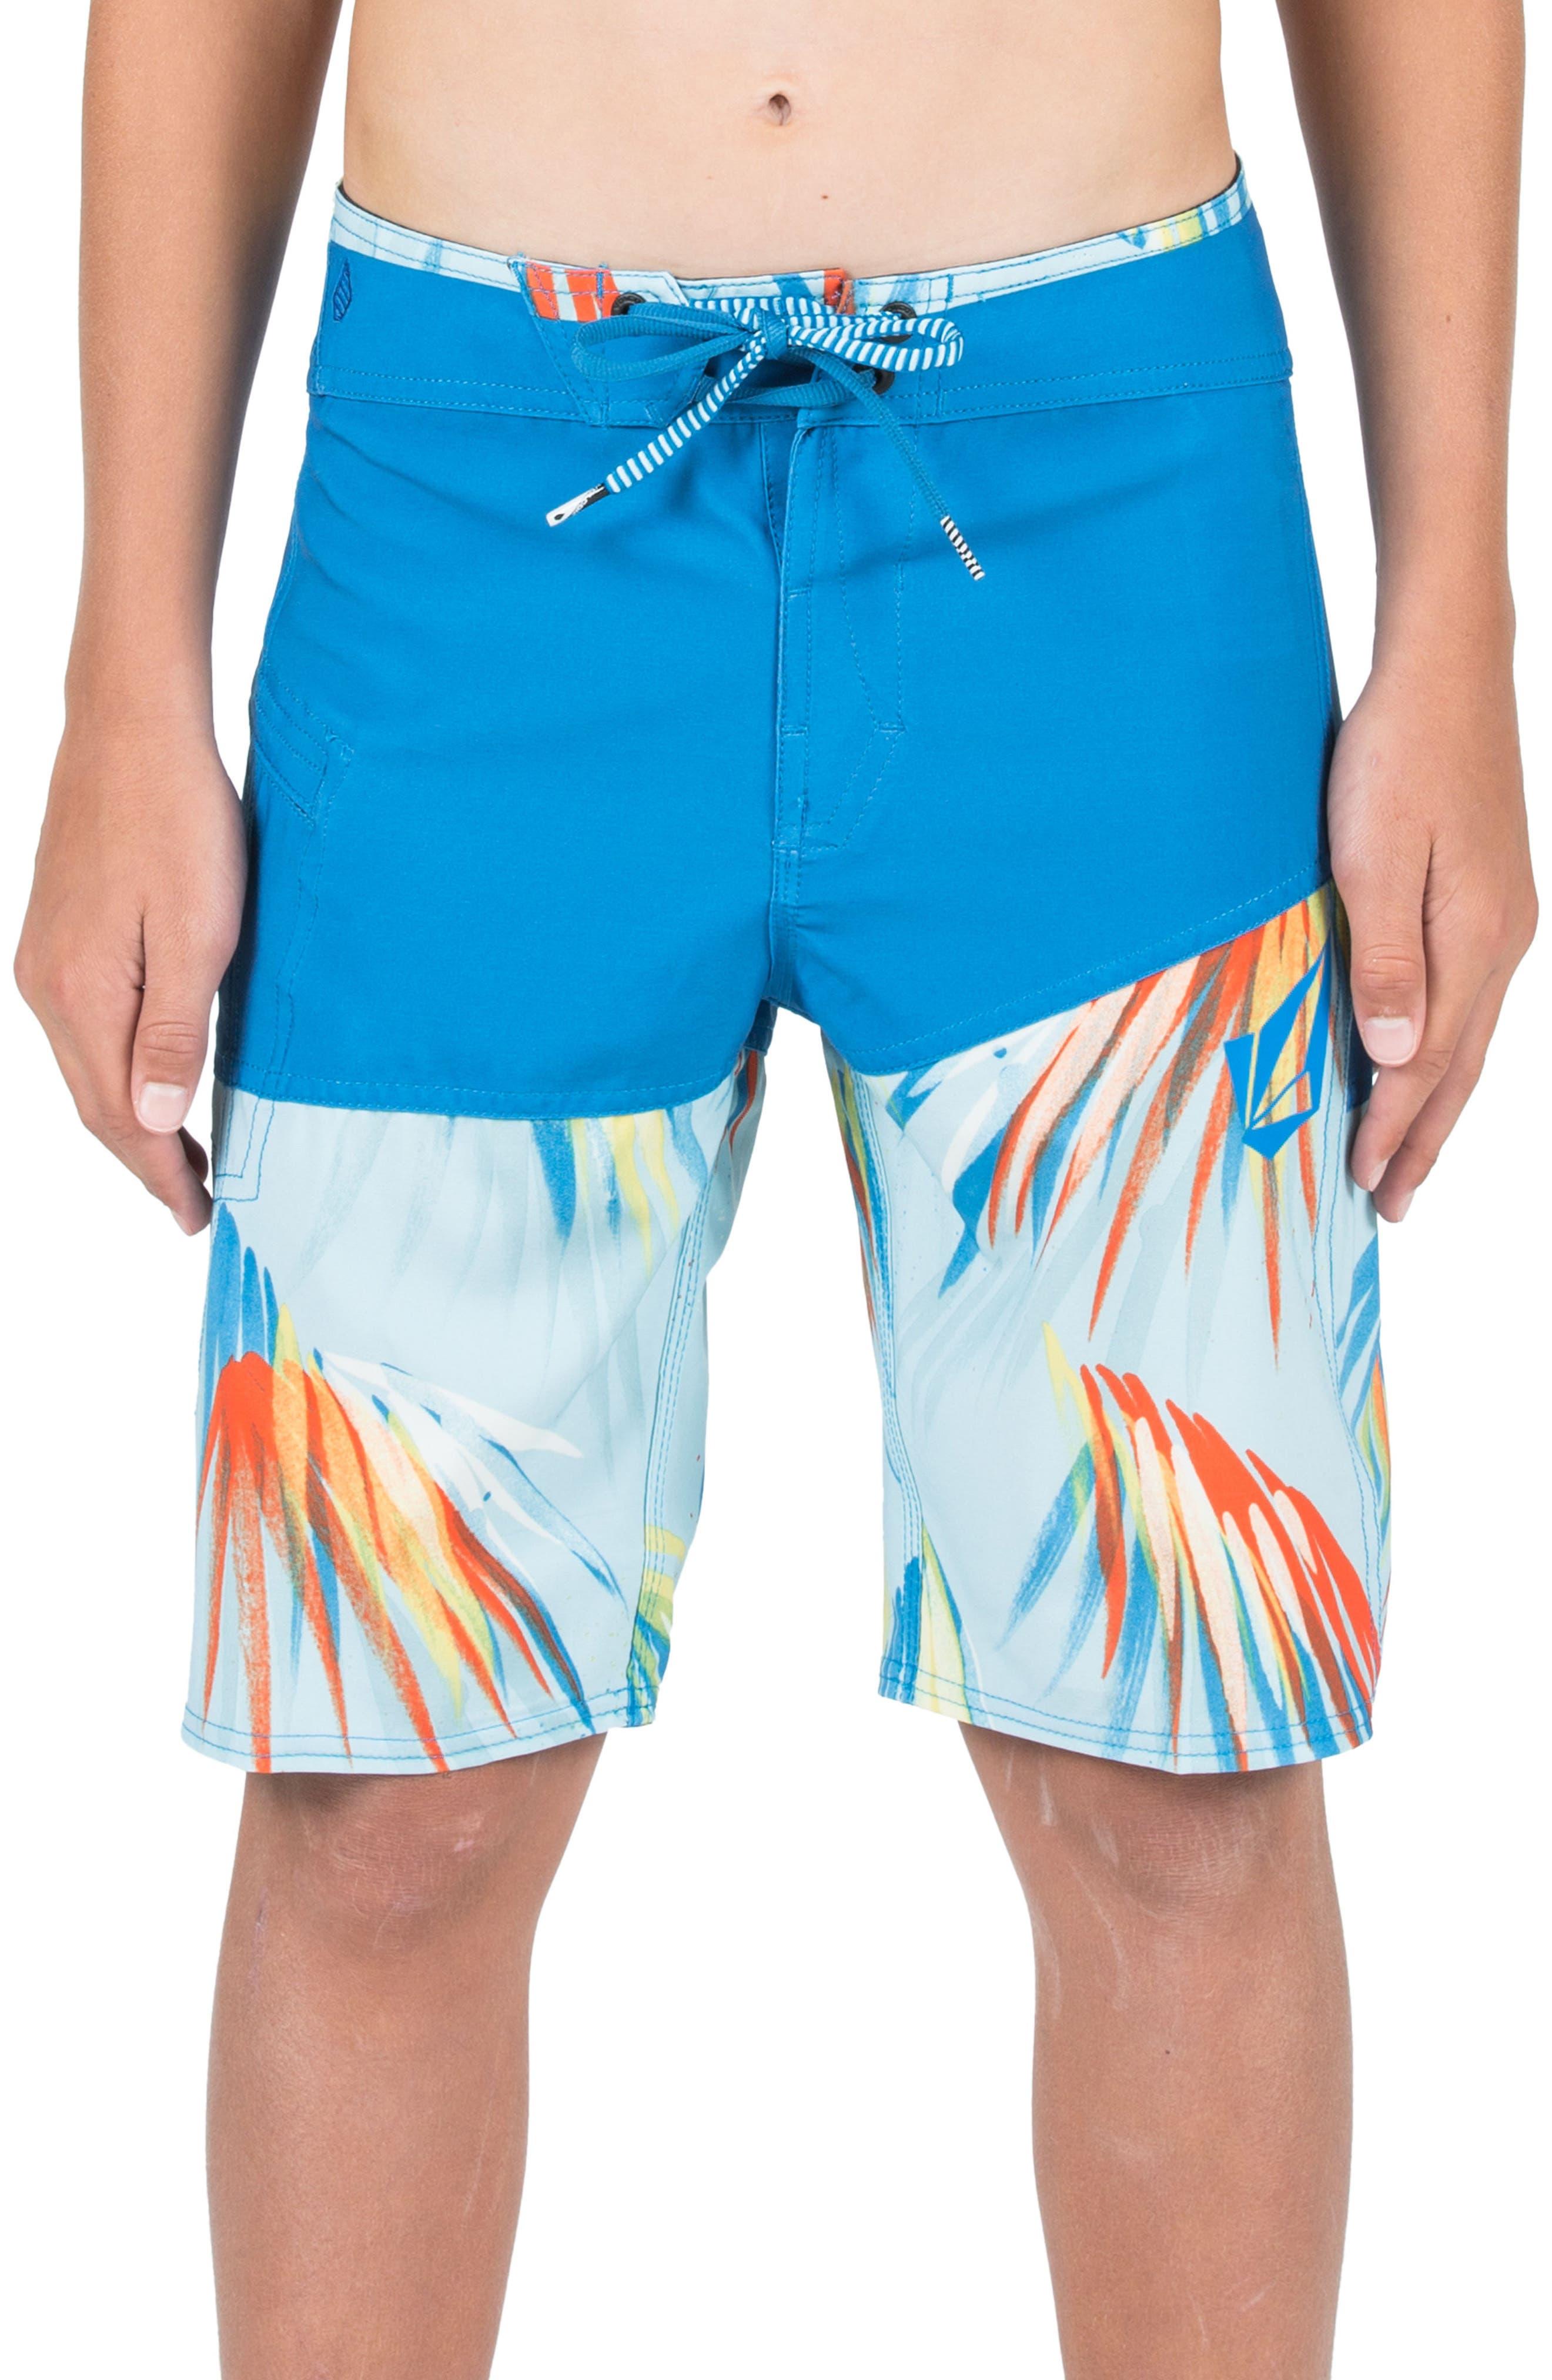 Asymmetrical Mod Board Shorts,                         Main,                         color, Cloud Blue